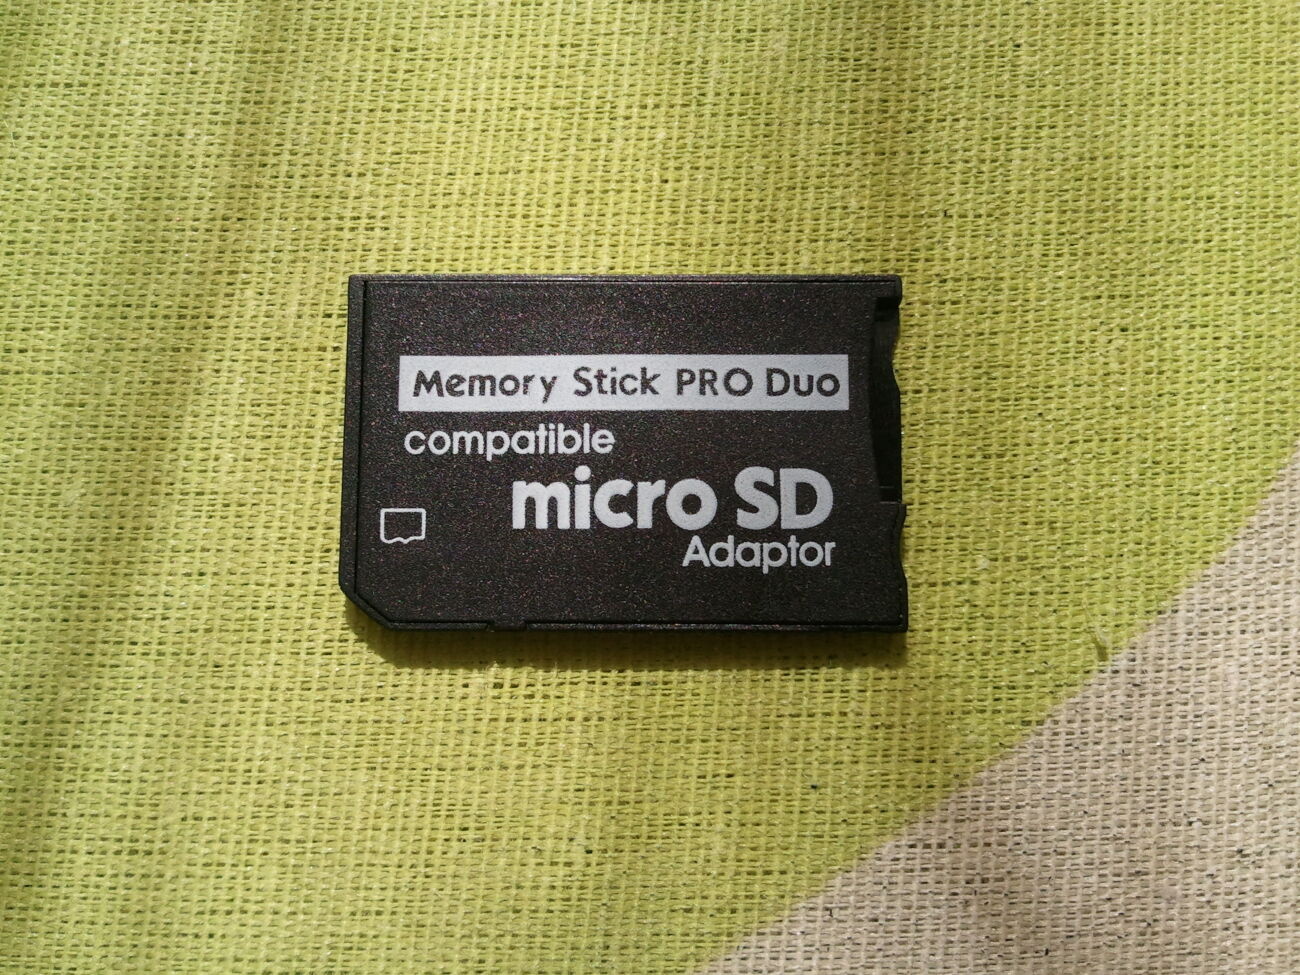 Адаптер Micro SD TF в MS Pro Duo, переходник для PSP Sony